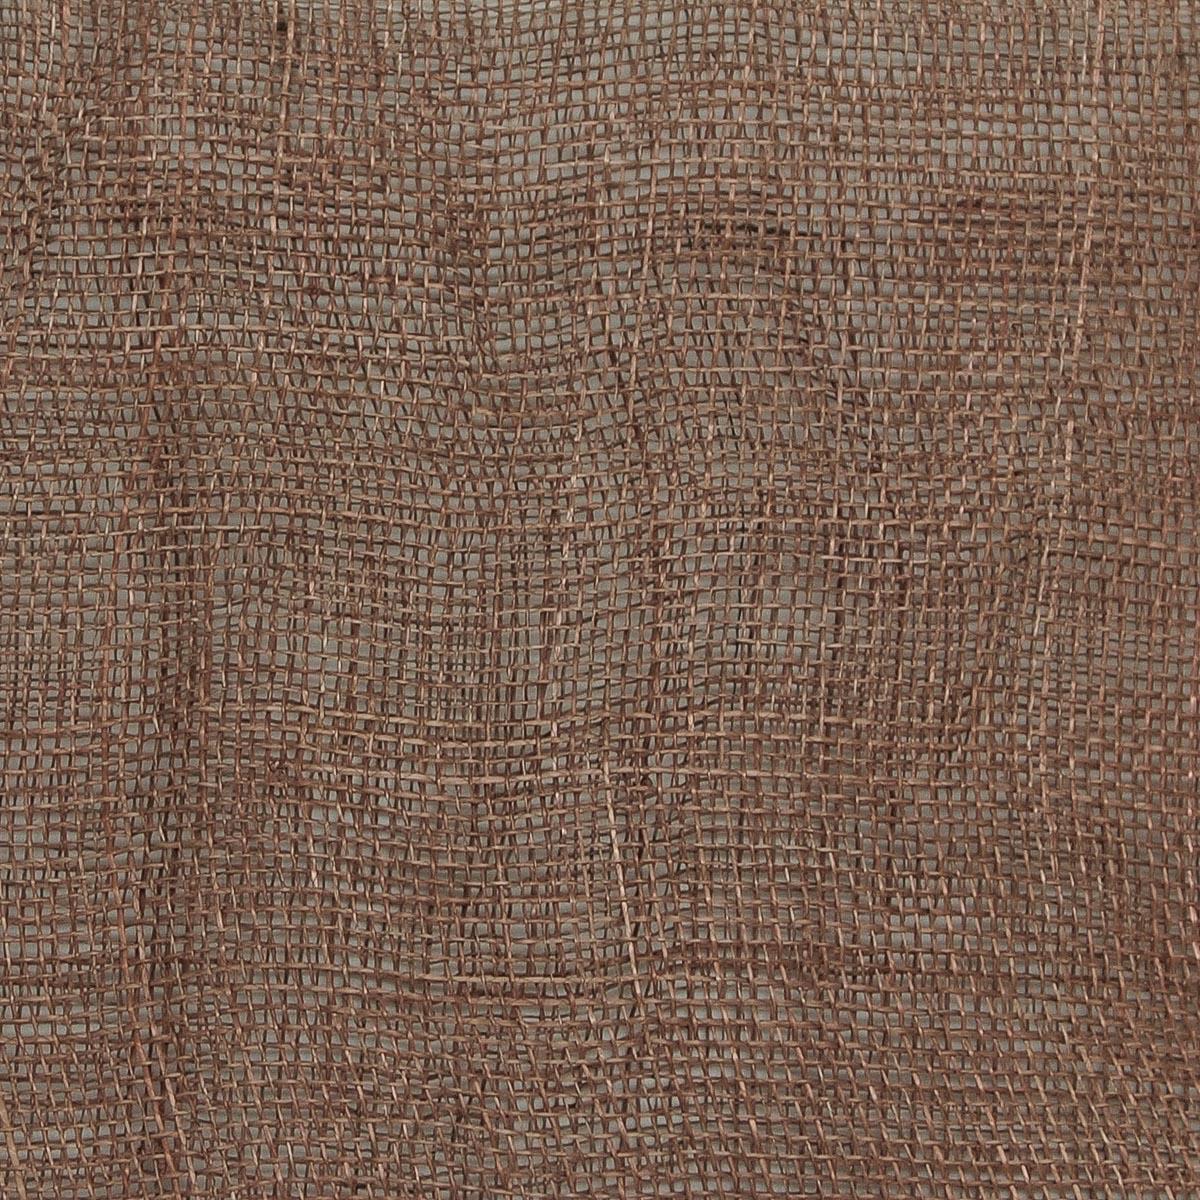 Light Brown Medium Sizing Stiff Sinamay Fabric-SH001-MS-042- Sun ... ff70717003a